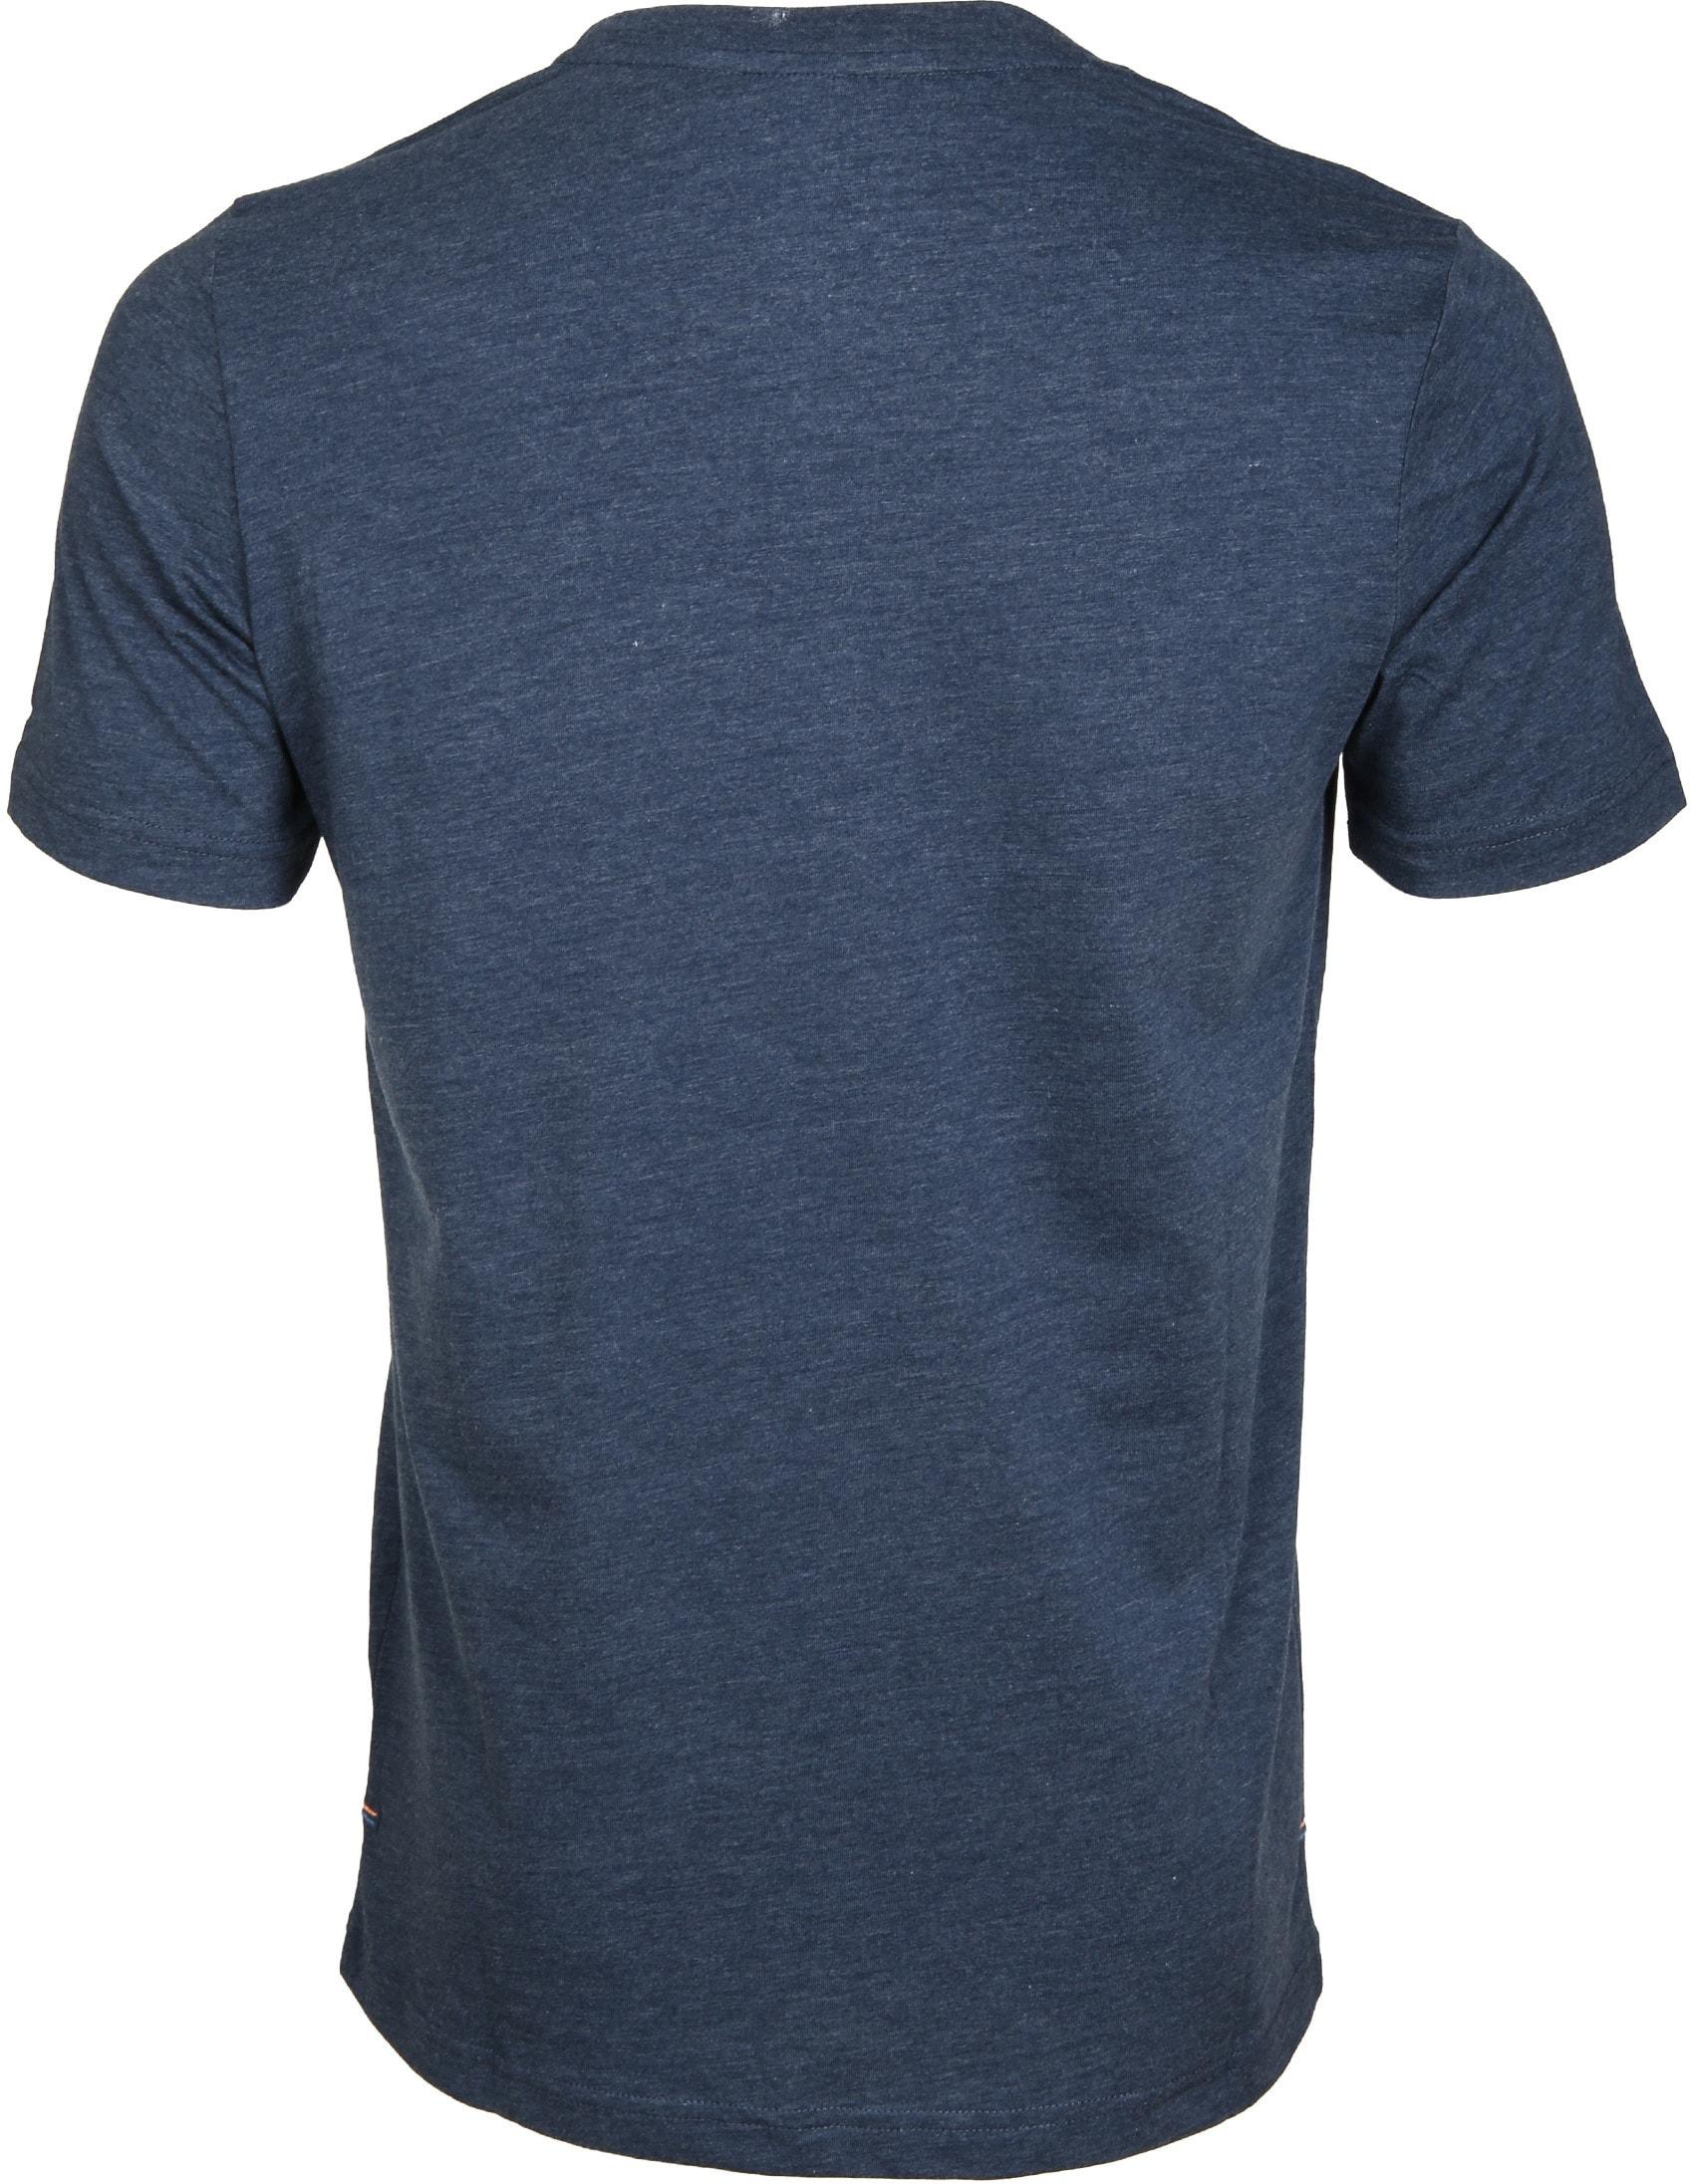 NZA Hapuka T-shirt Navy foto 2